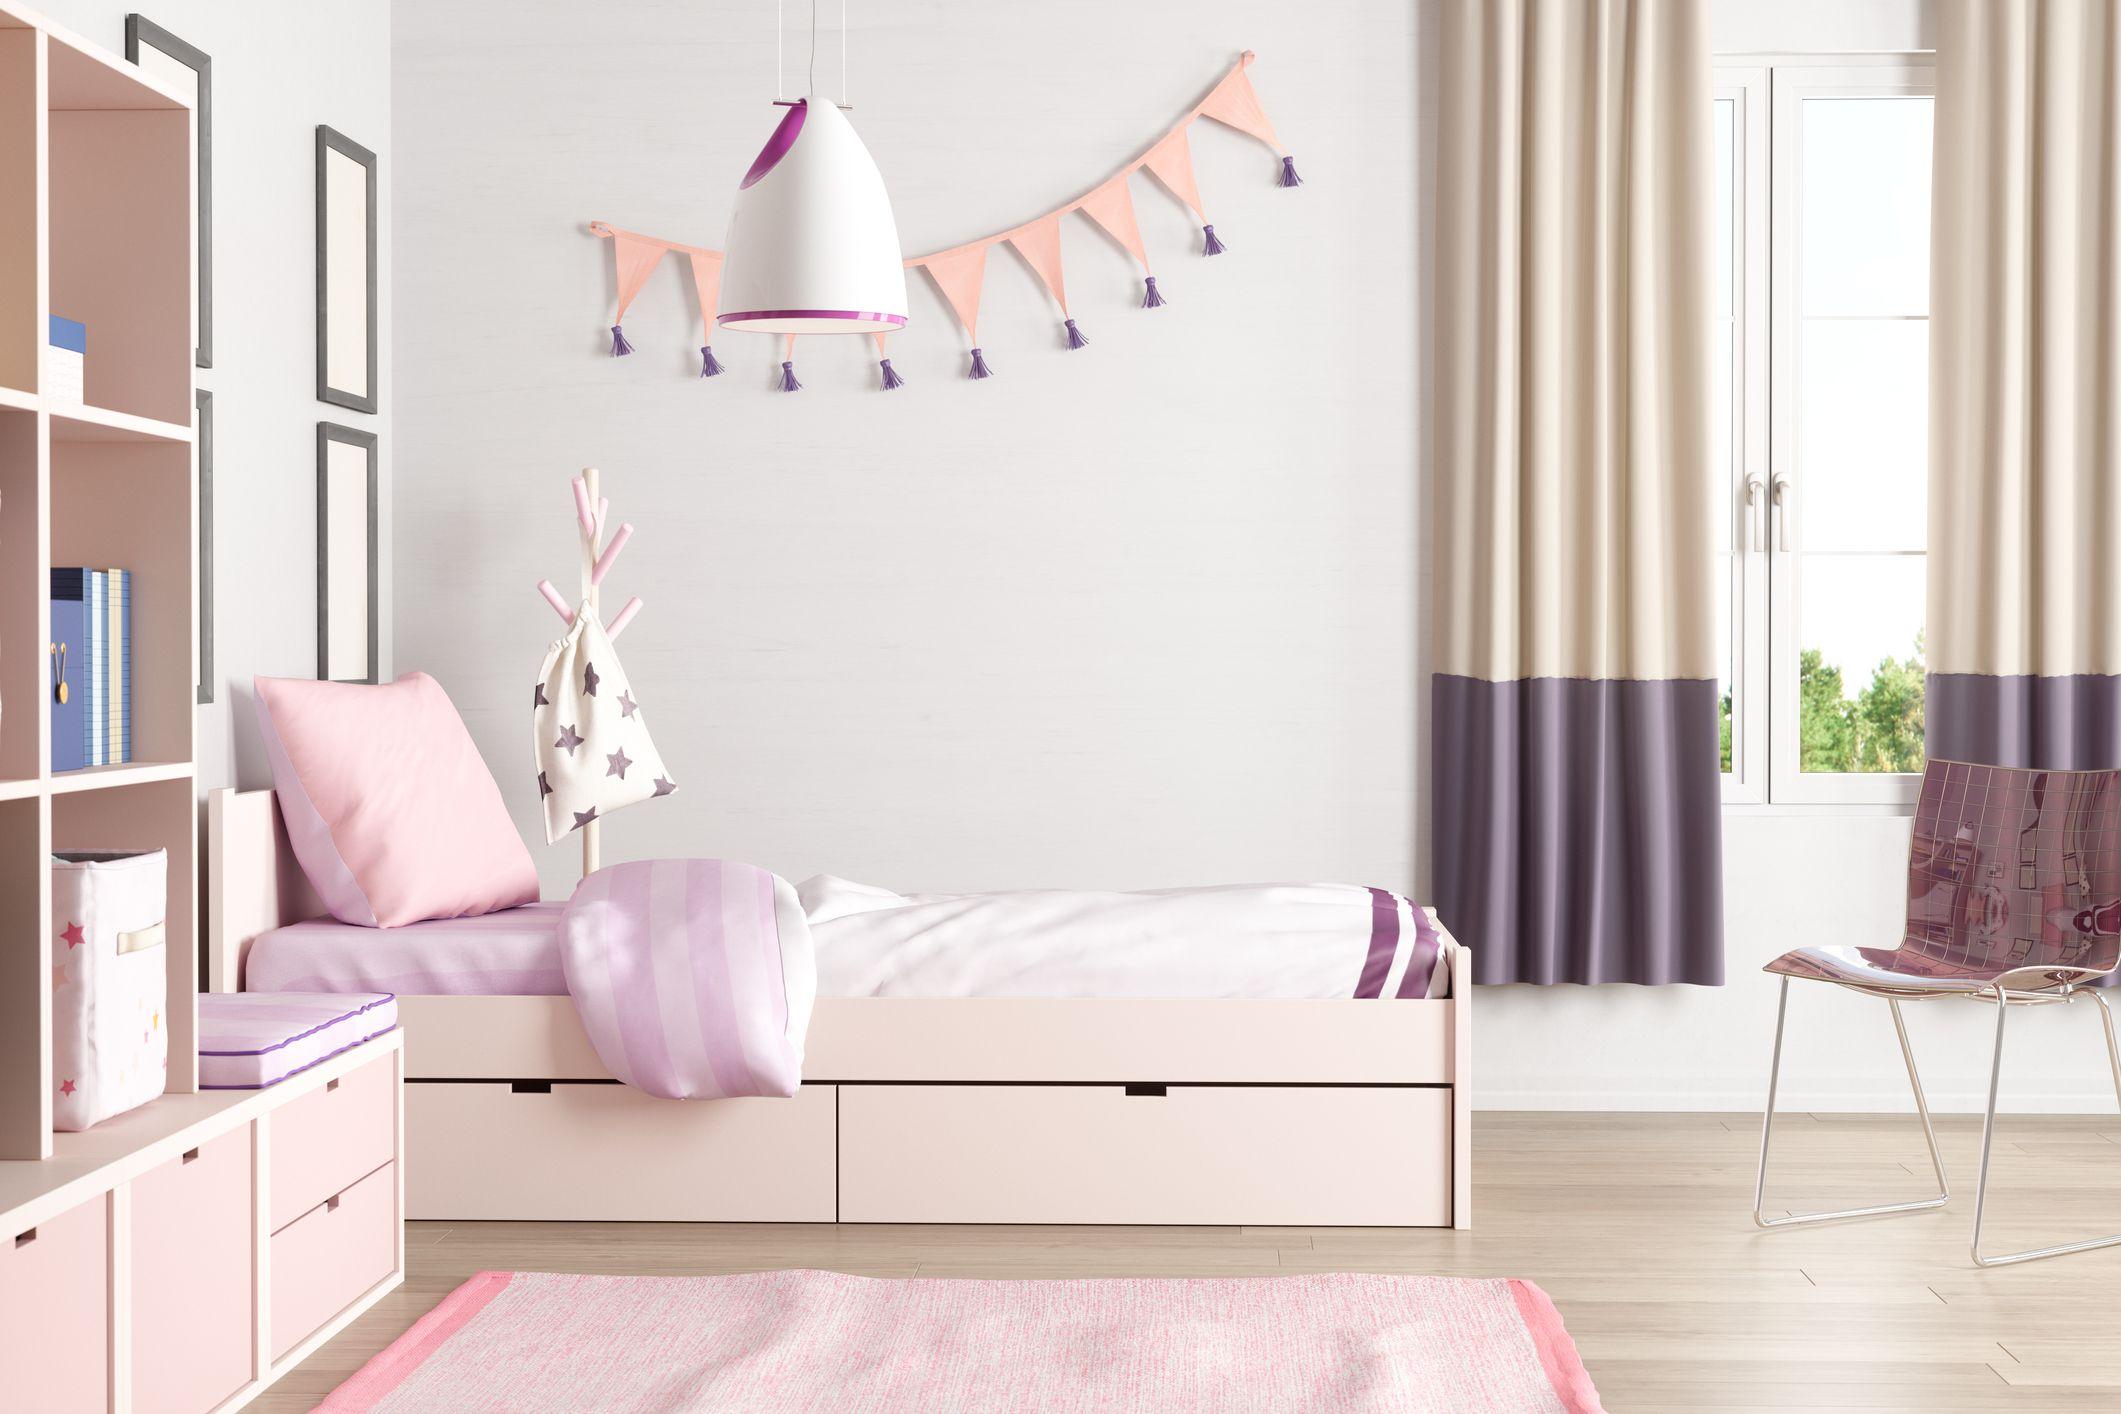 Budget Decorating Ideas for Teenage Bedrooms on Teenage Room Decorations  id=73040